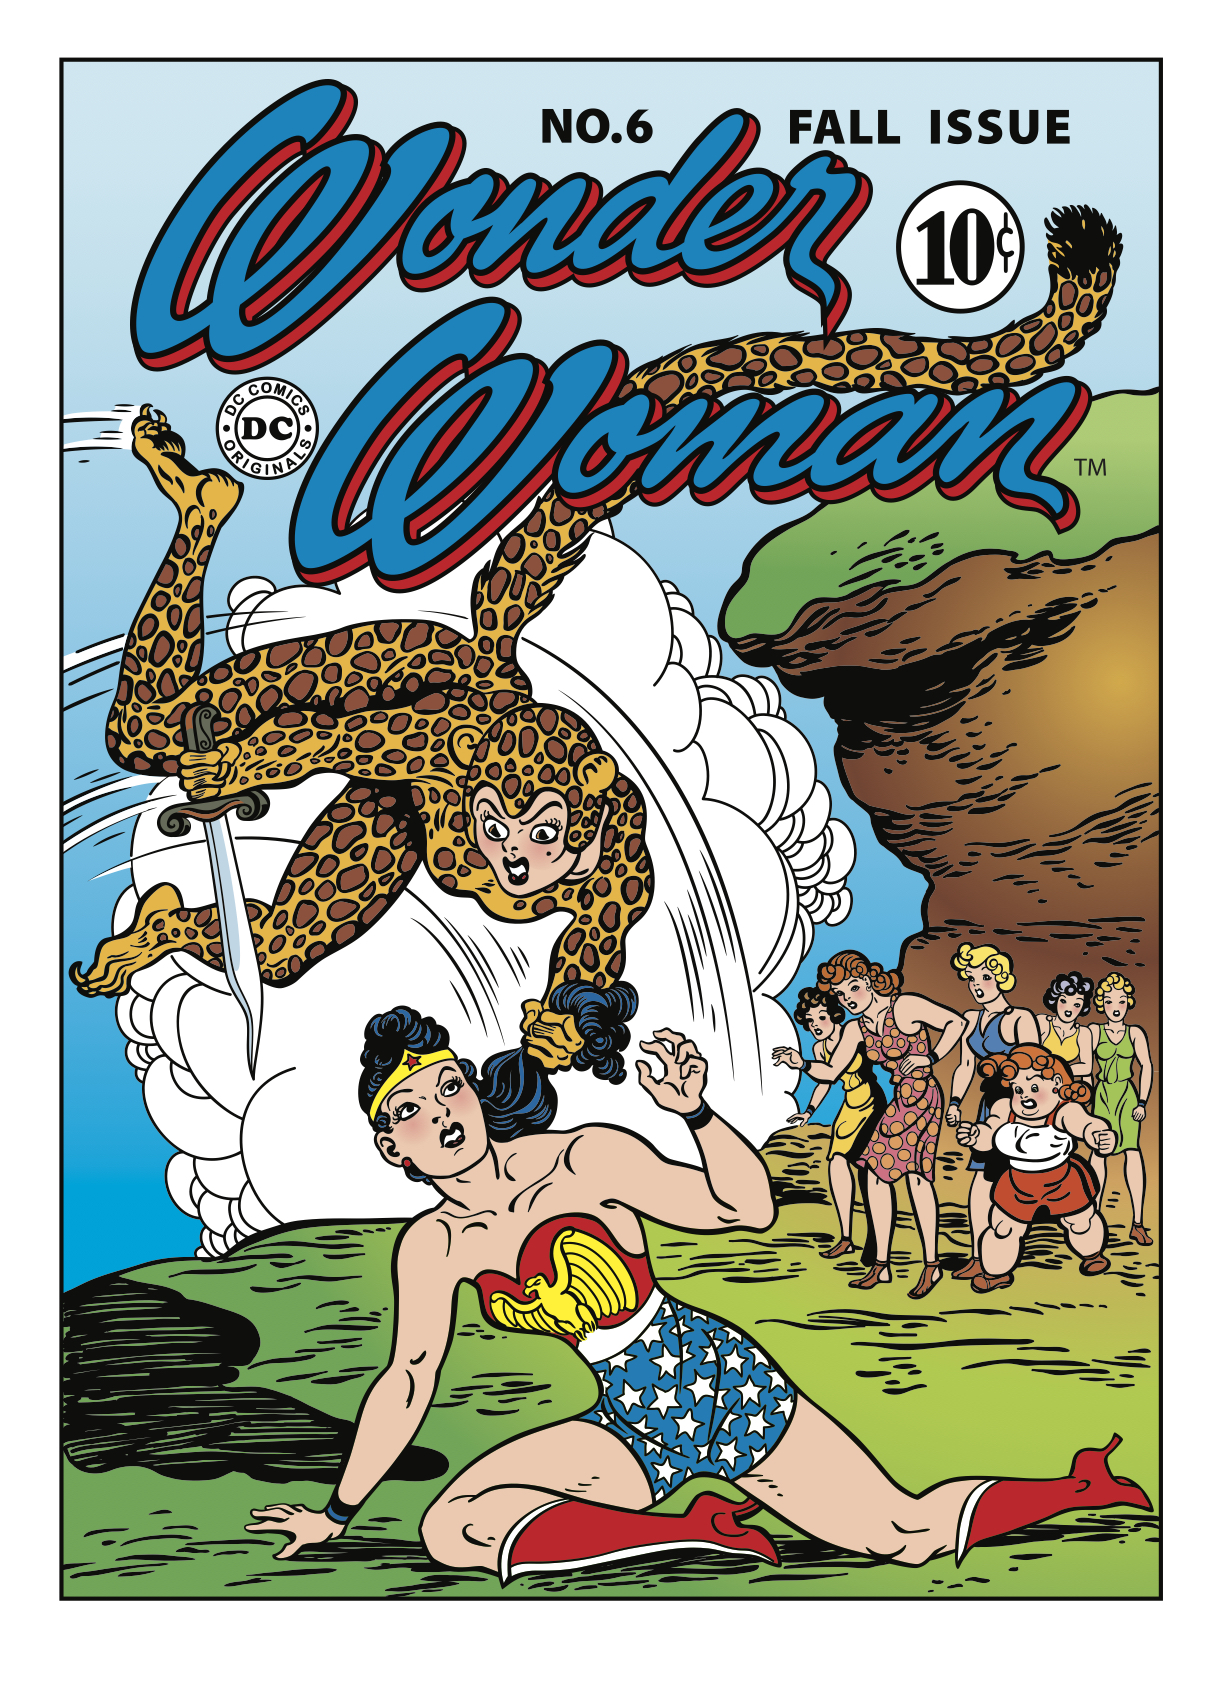 1943: Wonder Woman faces off against her nemesis, Cheetah.